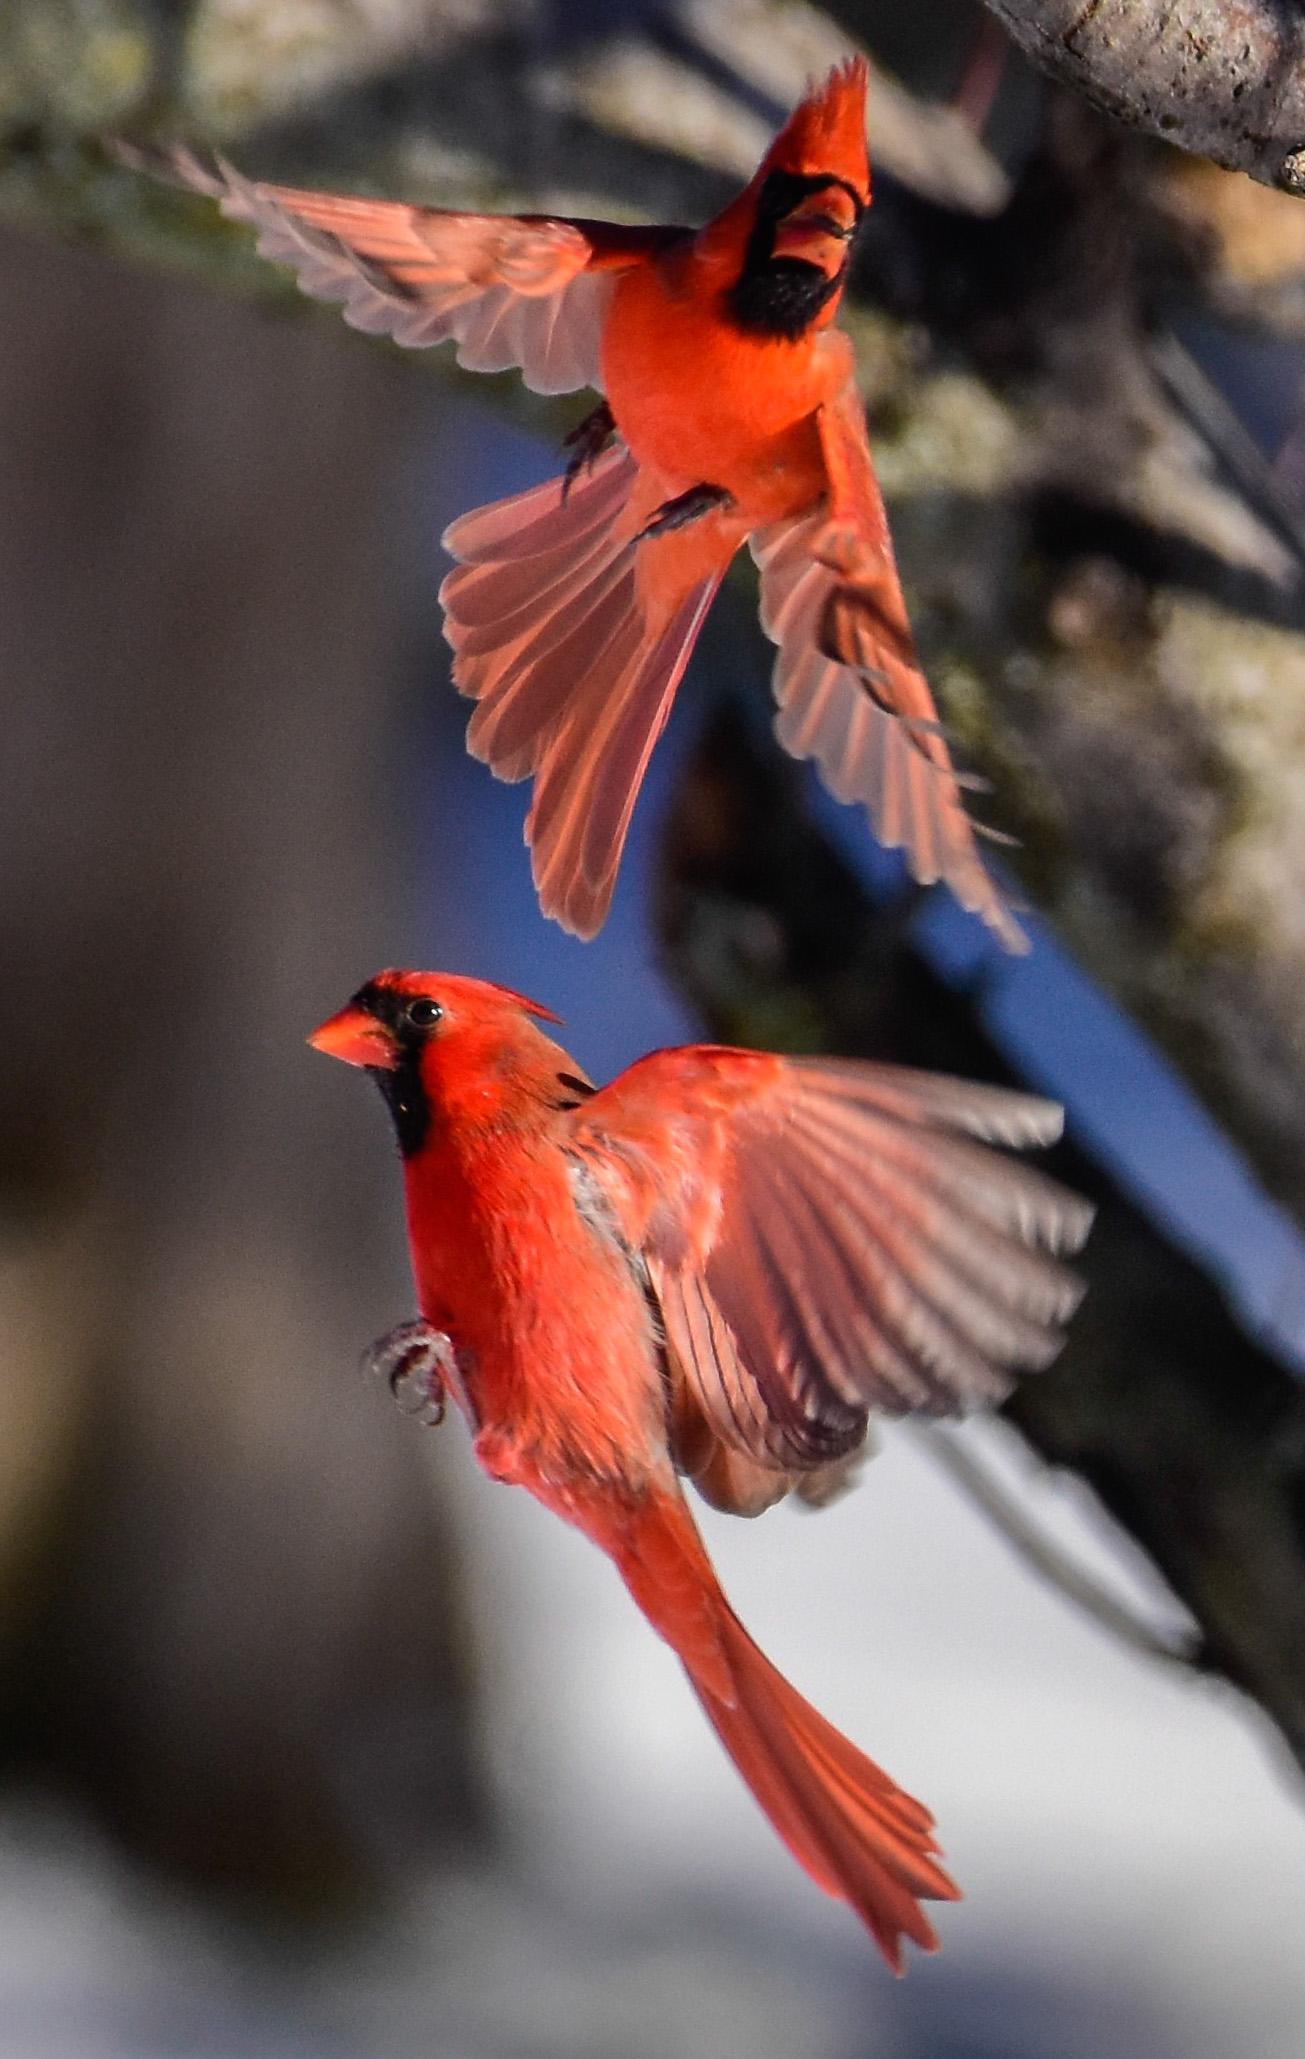 Male Cardinals in Flight